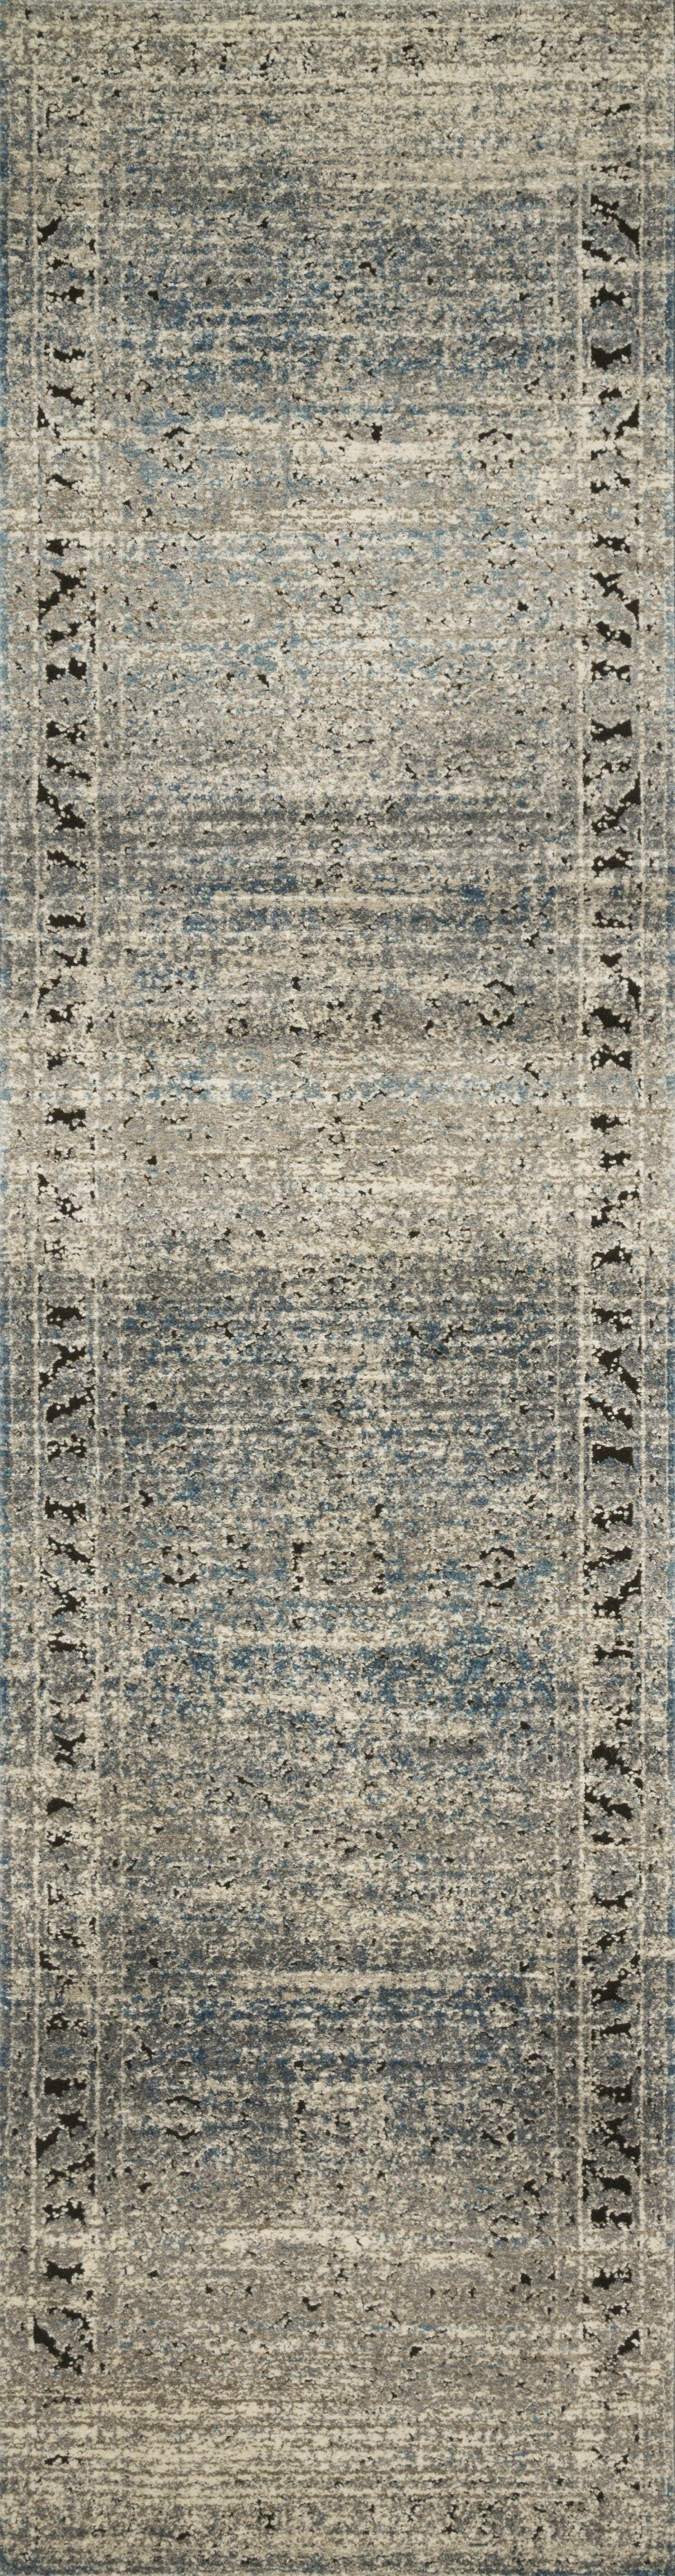 Diez Gray/Blue Area Rug Rug Size: Runner 2'8